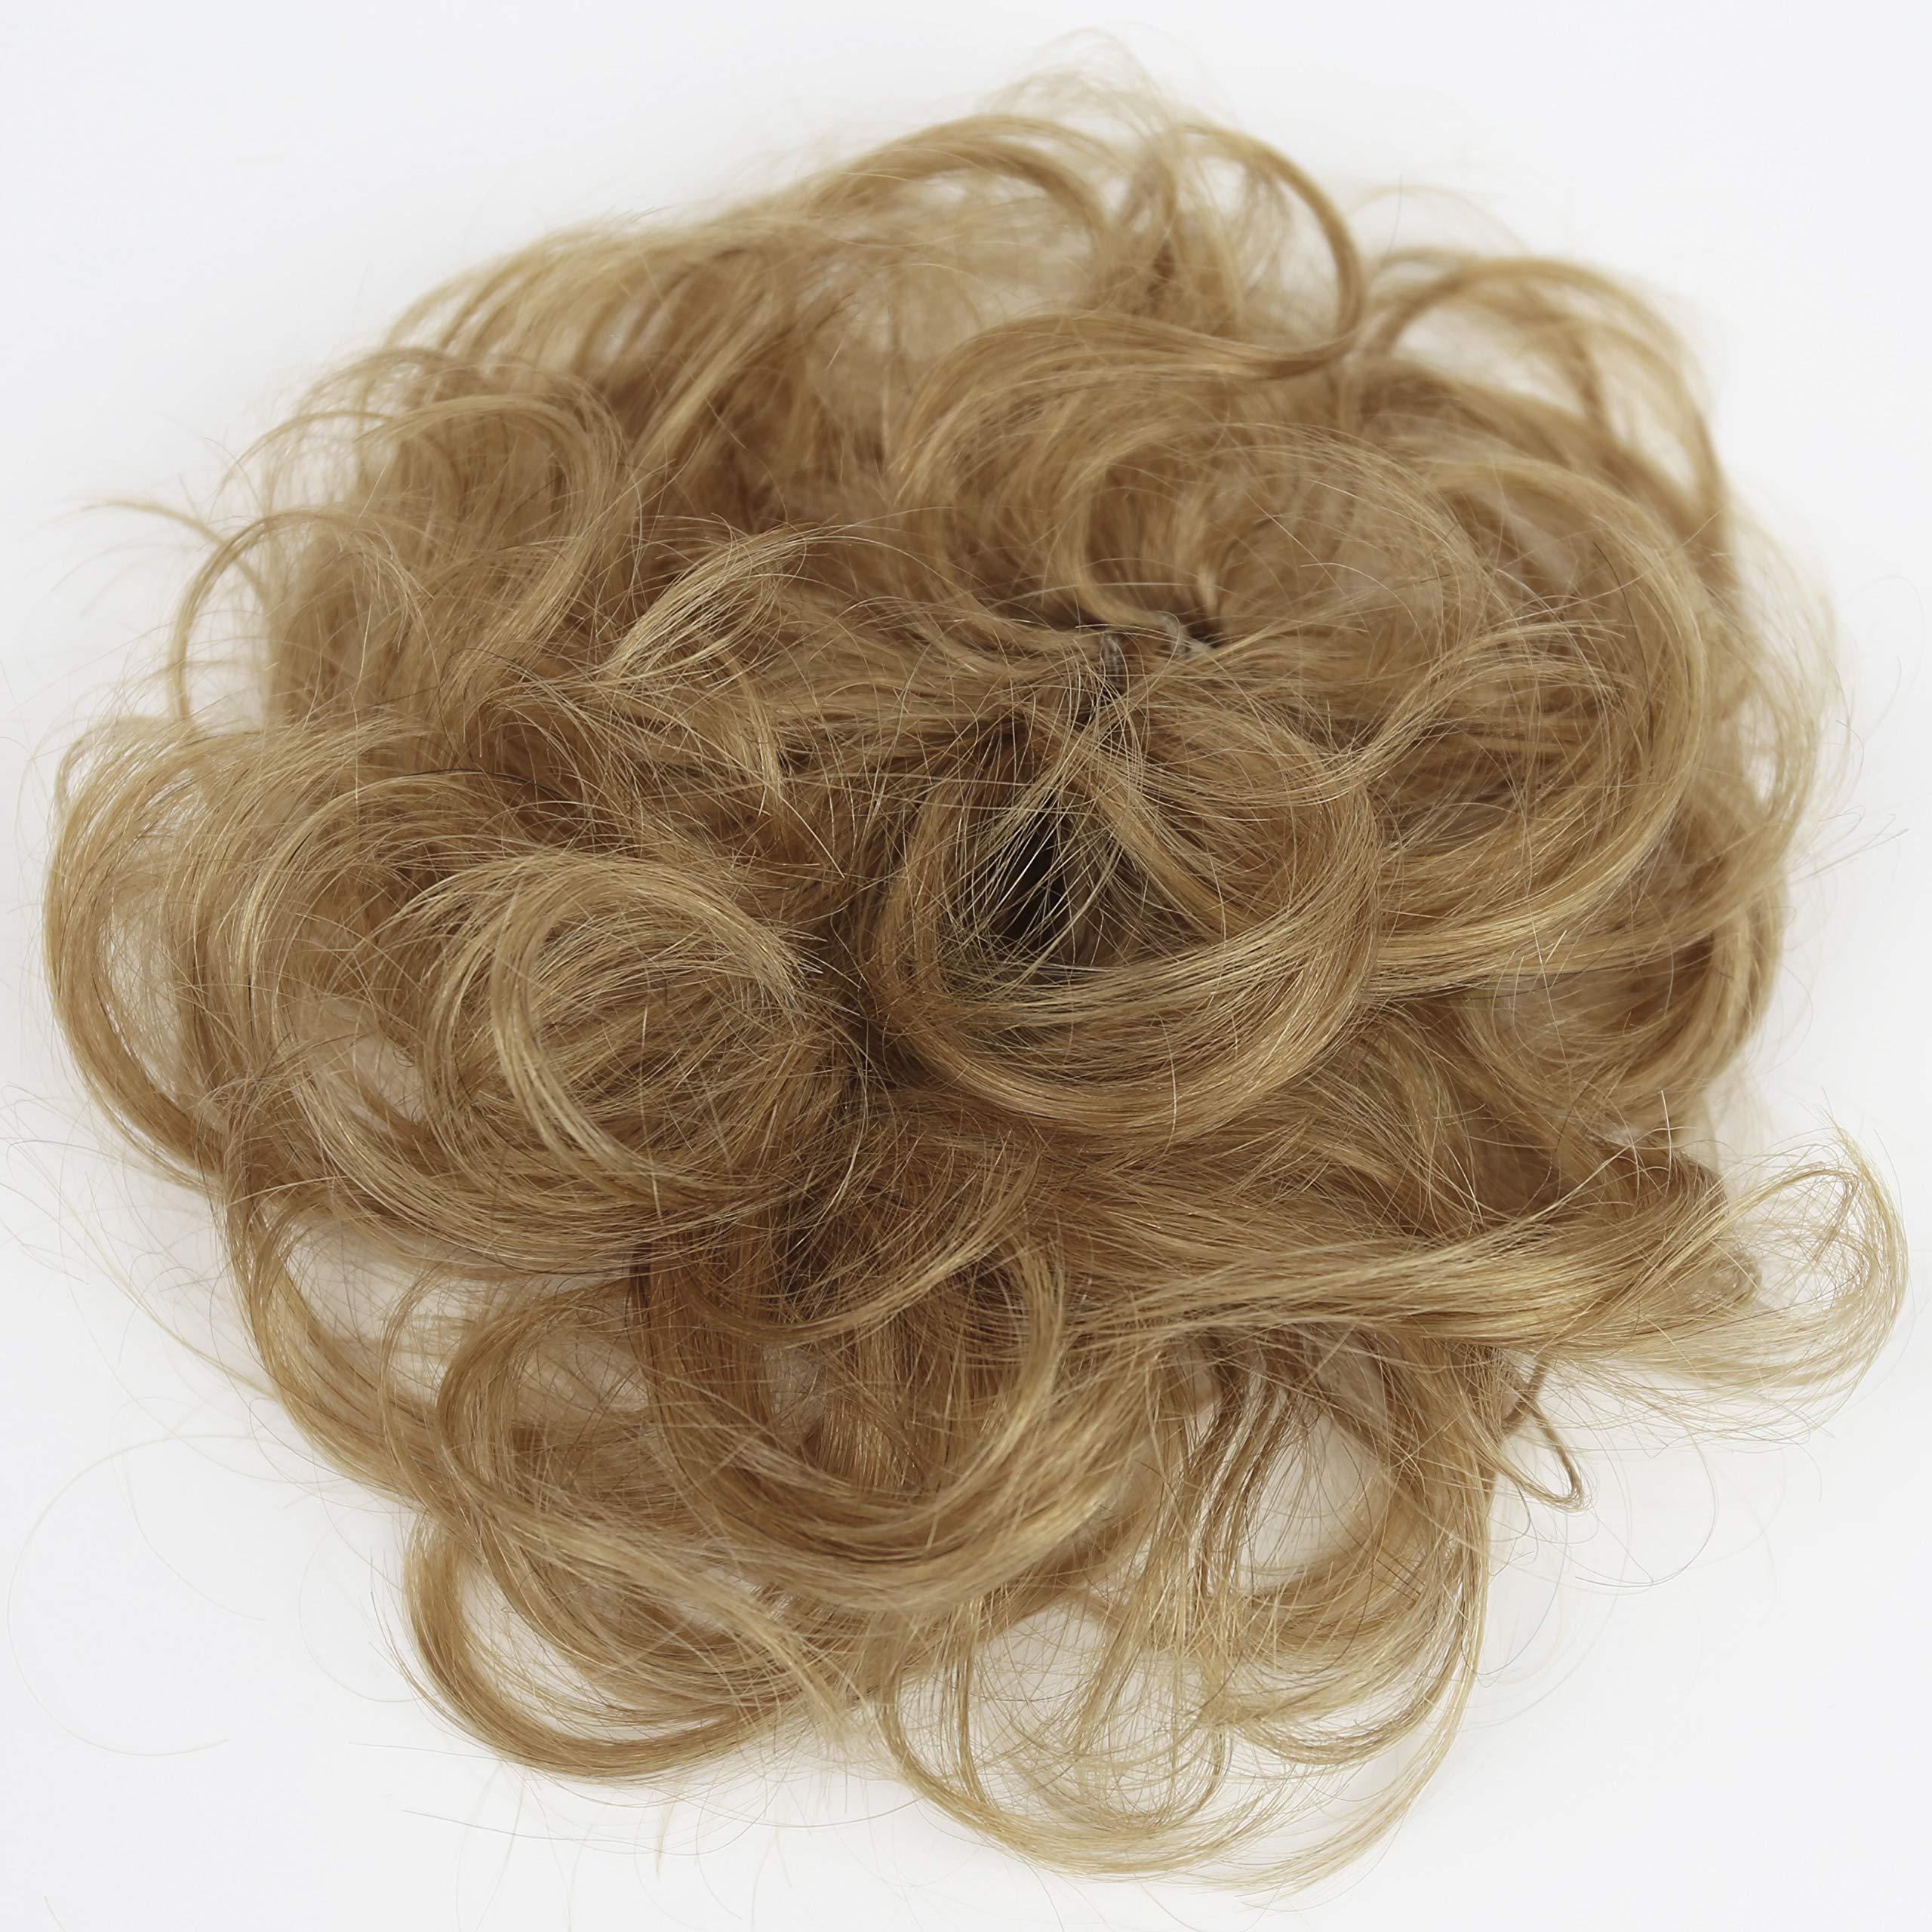 PRETTYSHOP 100% Human Hair Up Scrunchie Scrunchy Extensions Hairpiece Do Bun Ponytail Diverse Colors (strawberry blonde 27 H312) by Prettyshop Human Hair